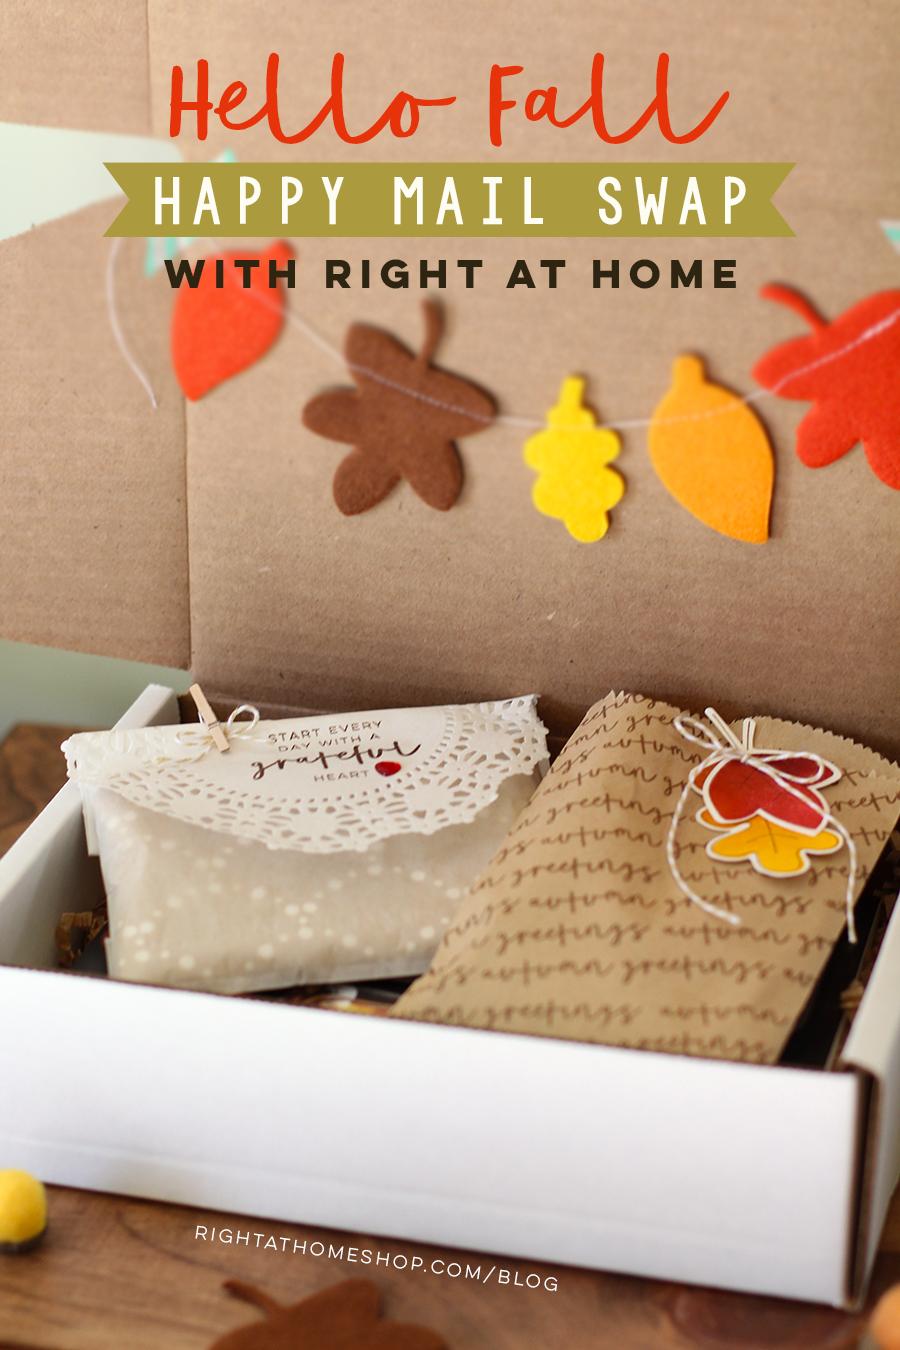 Hello Fall Happy Mail Swap Packaging Ideas by Nicole // rightathomeshop.com/blog